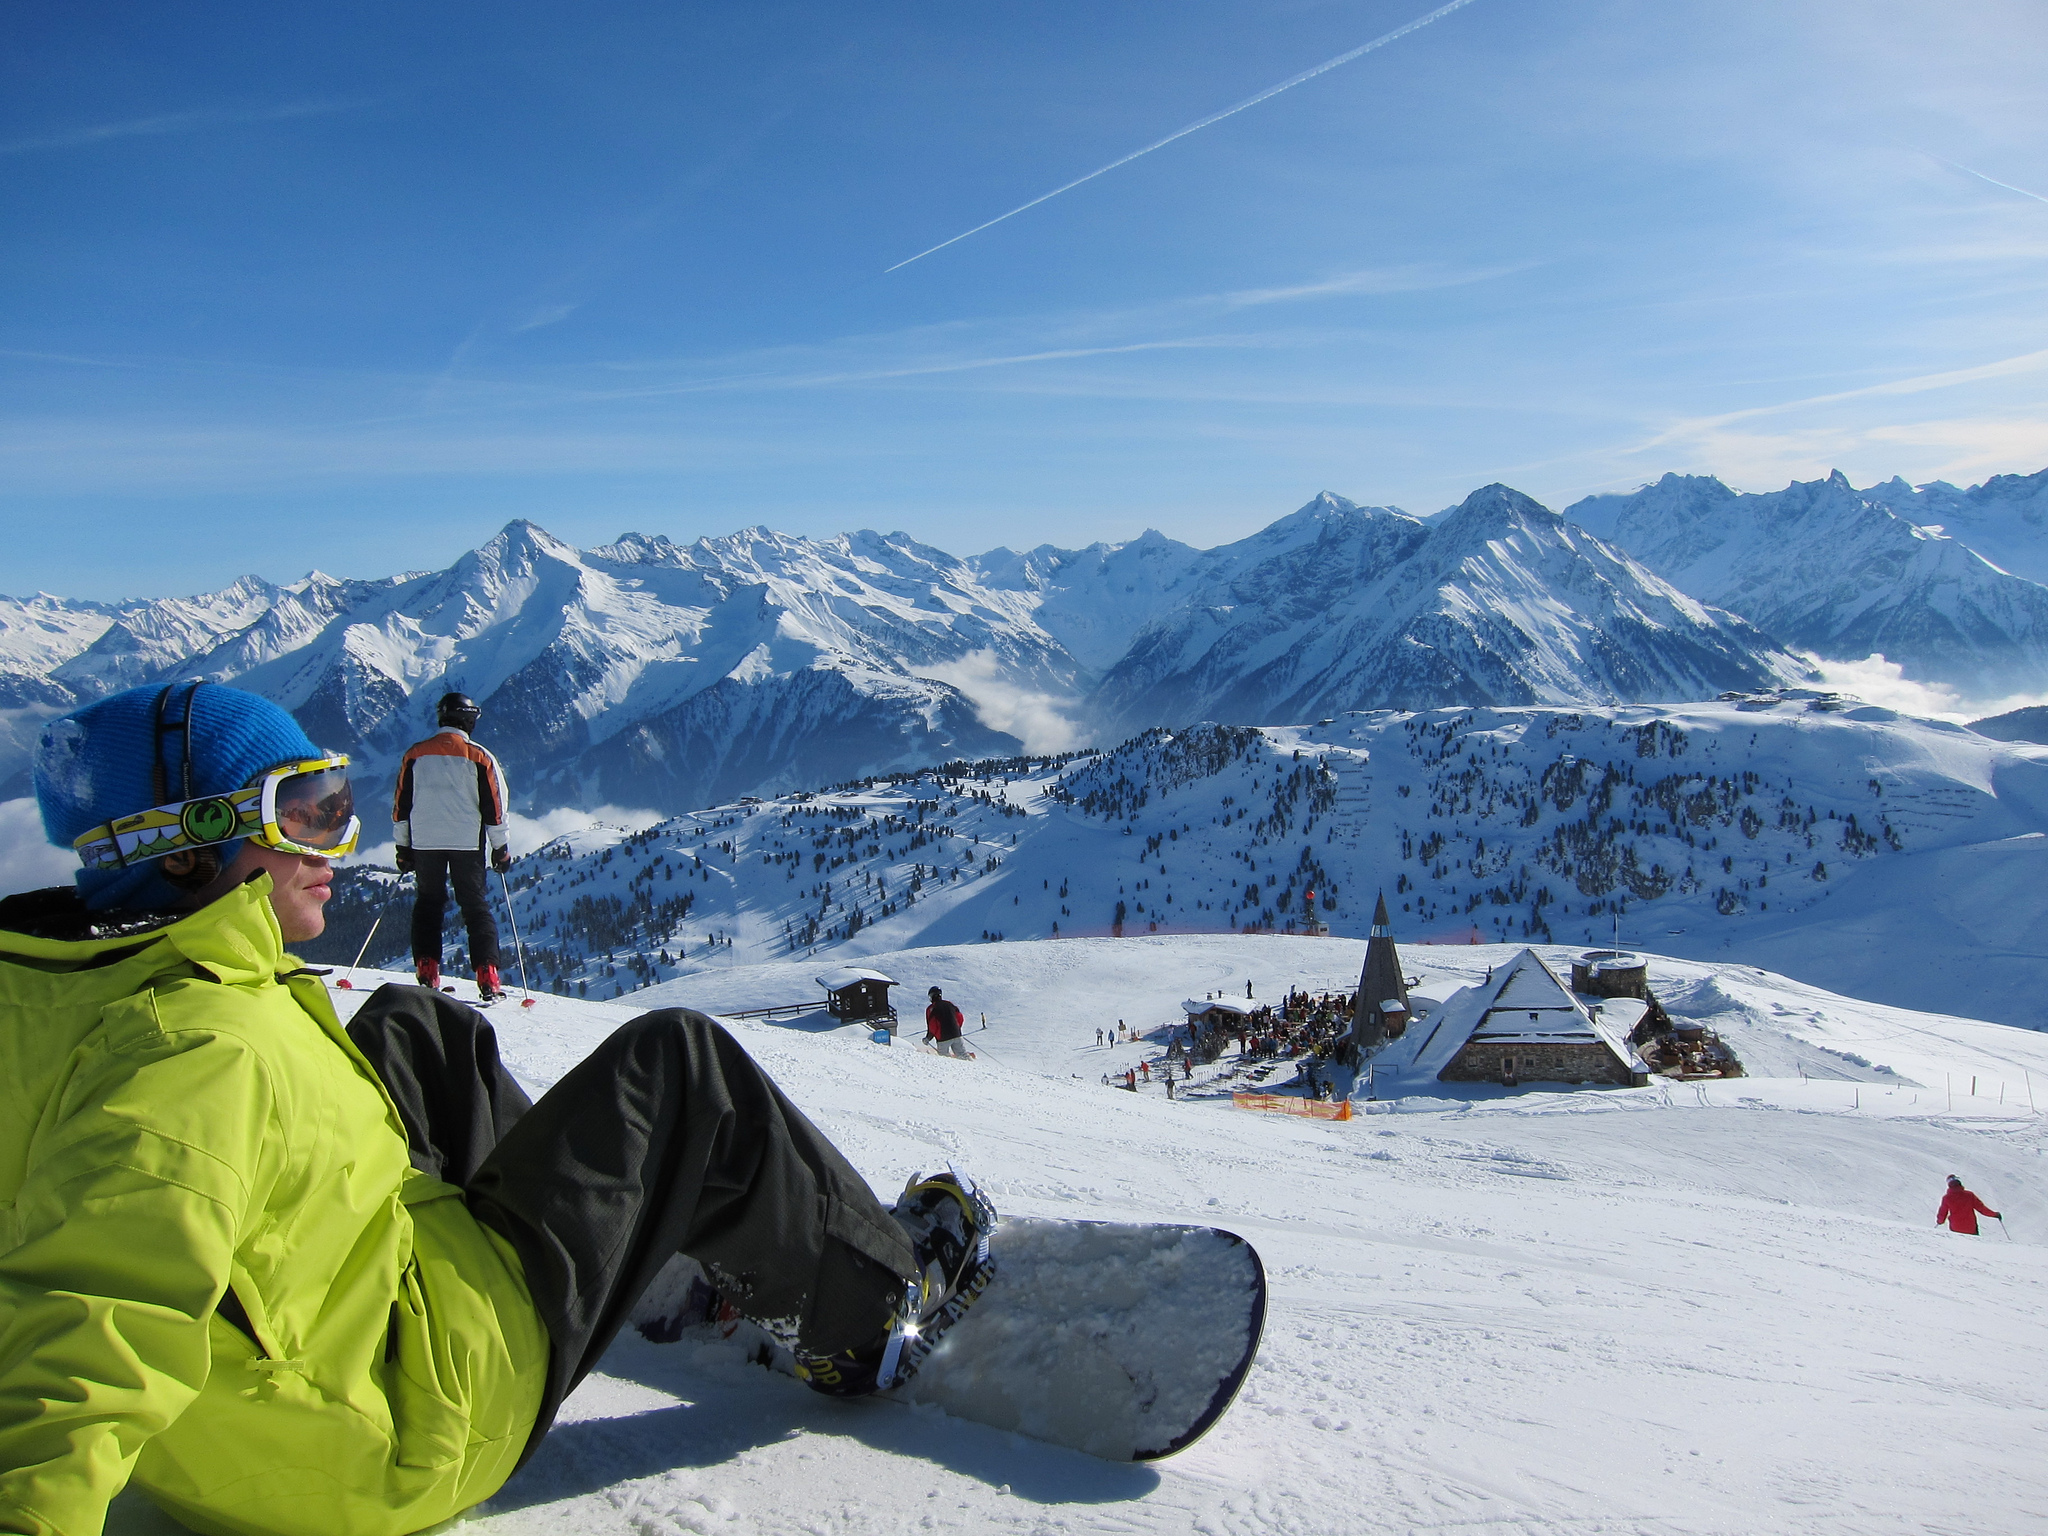 Ready to go snowboarding in Austria - Image: https://www.flickr.com/photos/howard_lloyd/